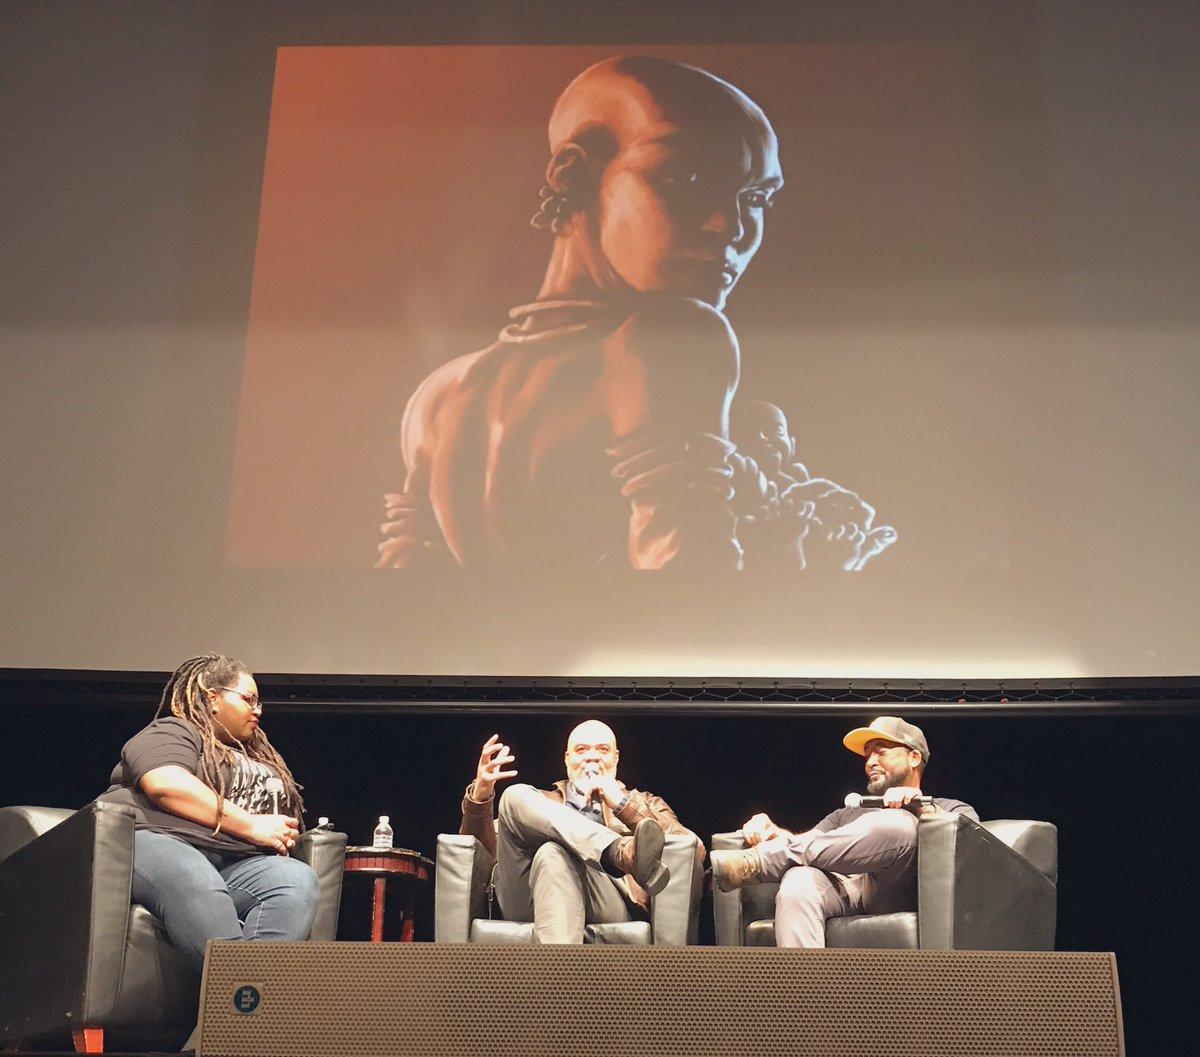 @FabulizeMag @Dieselfunkstu @DreamFuryComics talking Sci-Fi, Afrofuturism, and Beyond @SchomburgCenter's #SchomCom2020 #BlackComicBookFest #BCBF2020pic.twitter.com/9IHlM4INr5